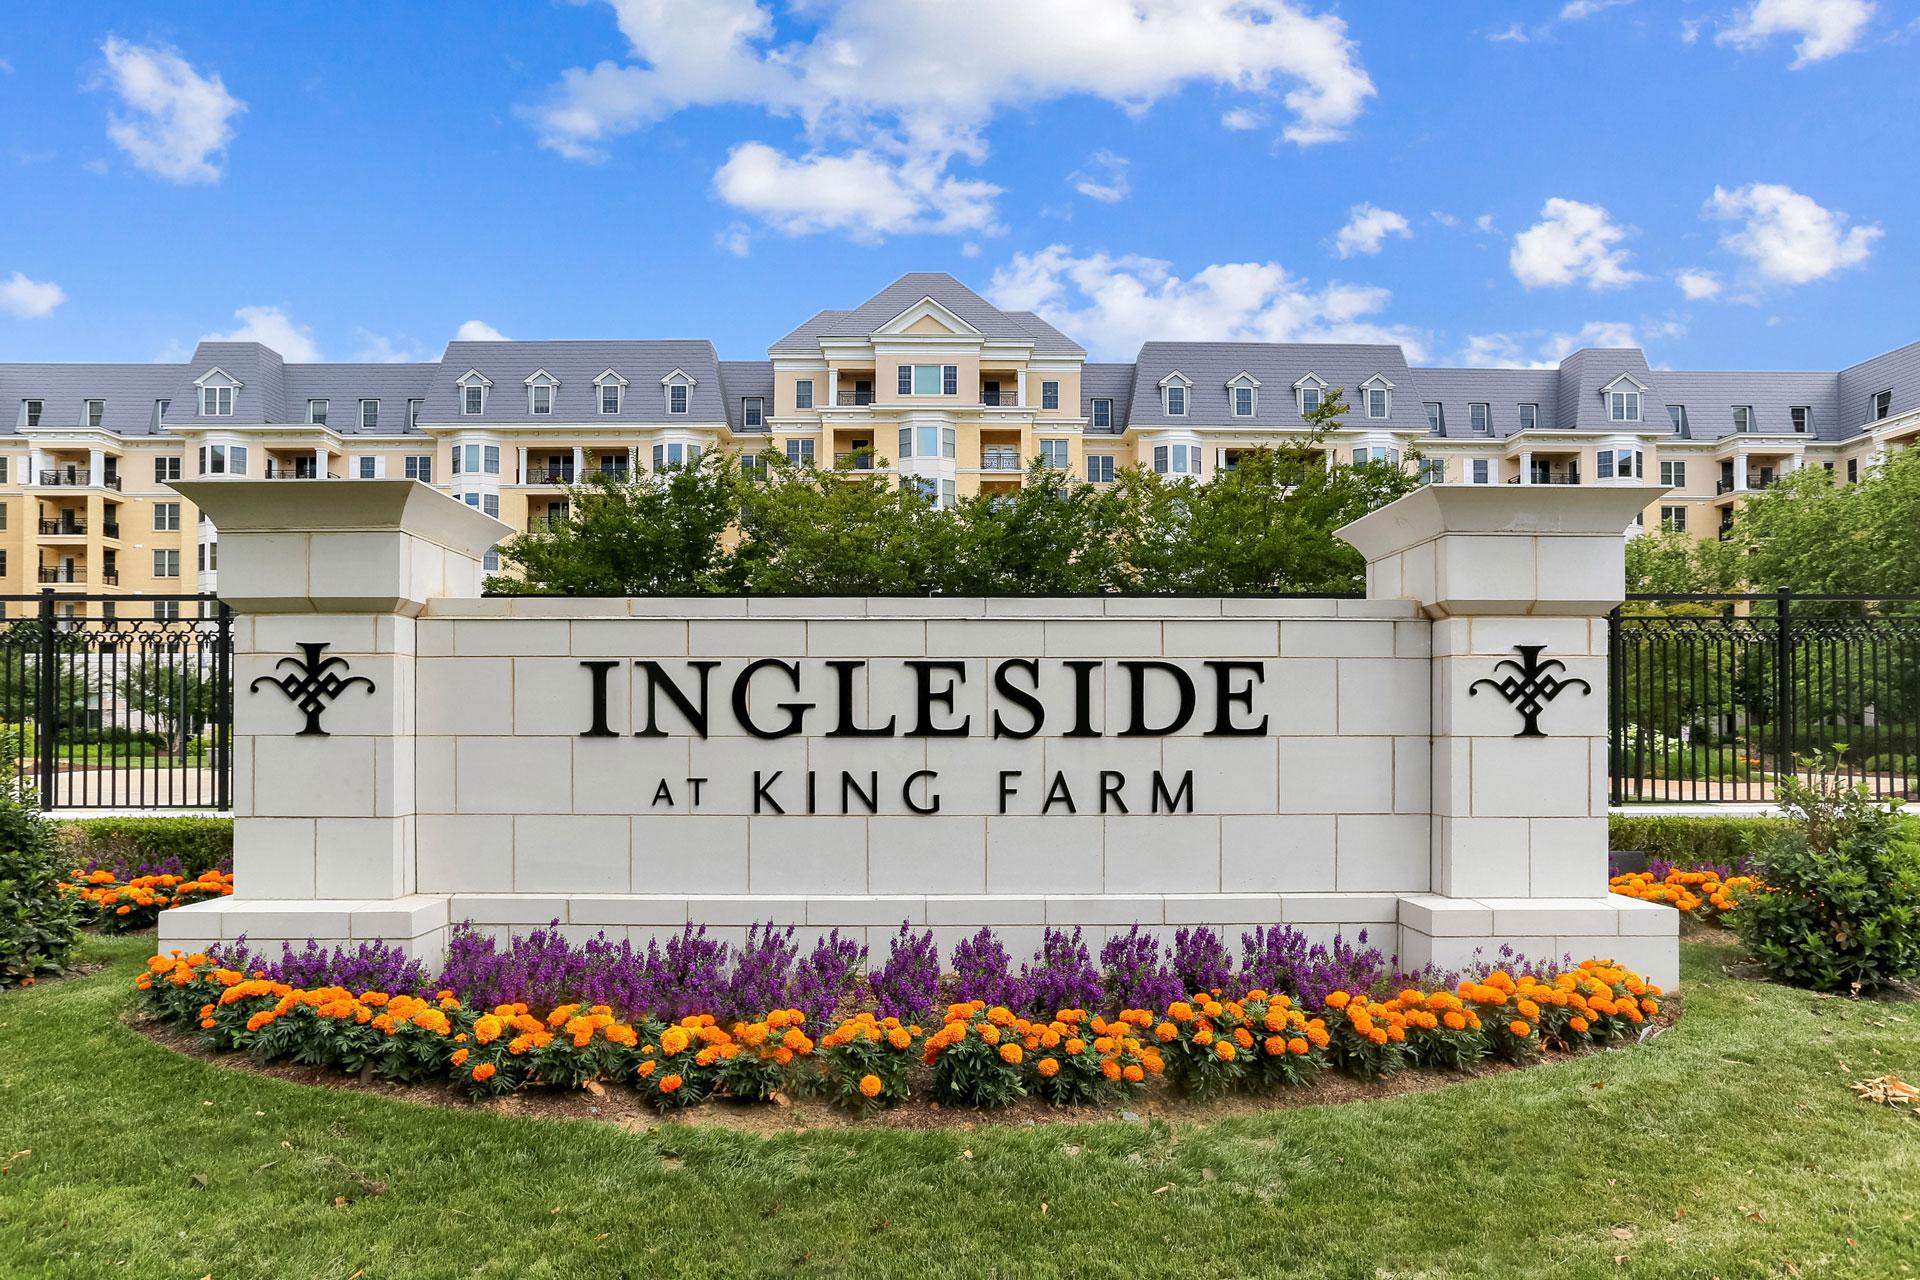 Ingleside at King Farm signage